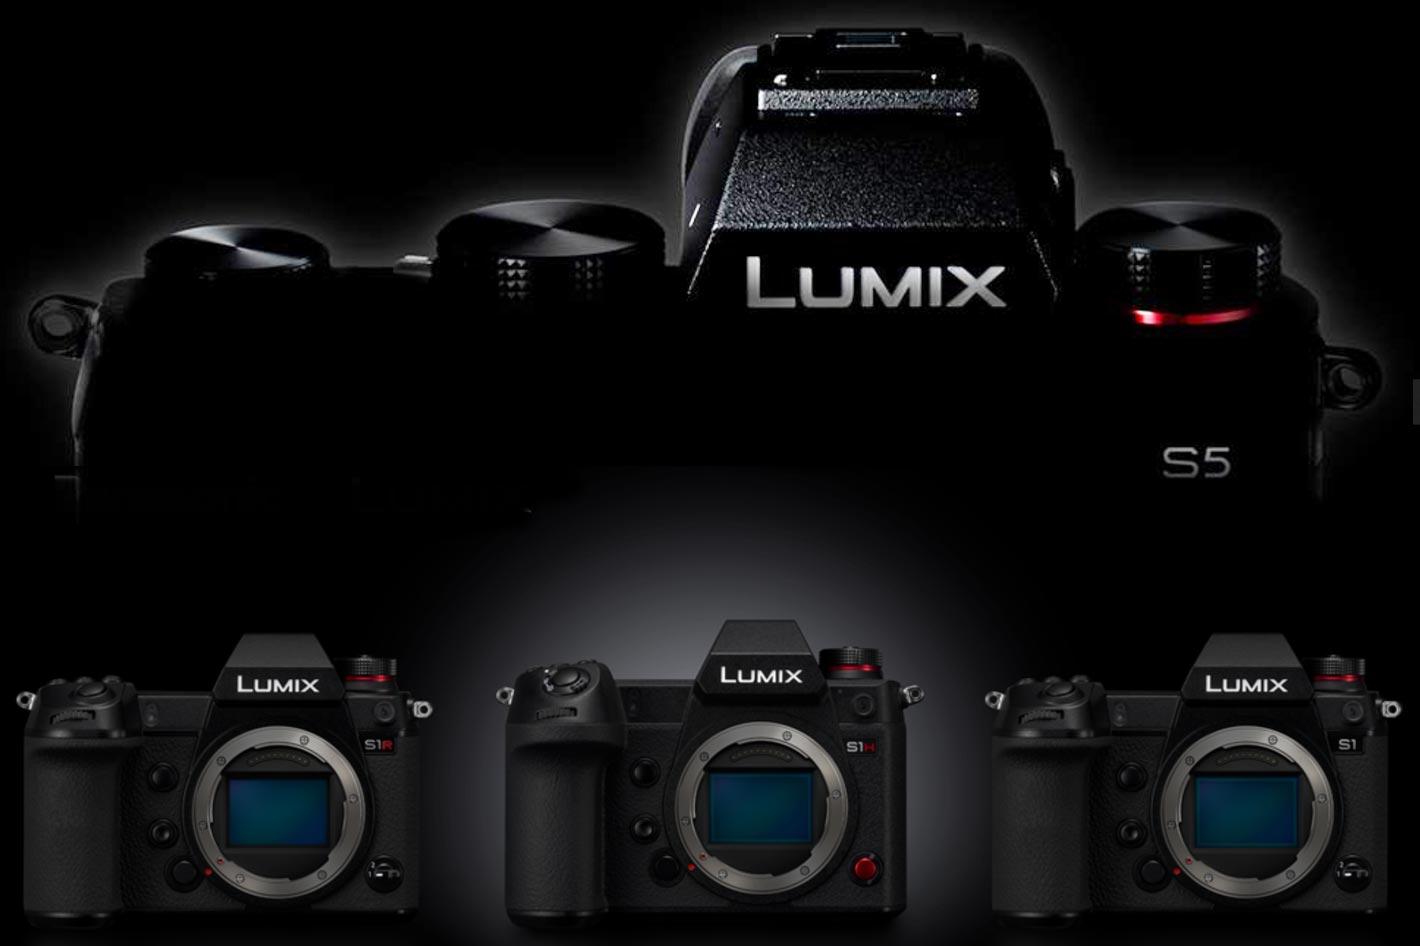 LUMIX S5: meeting the passionate demands of all creators